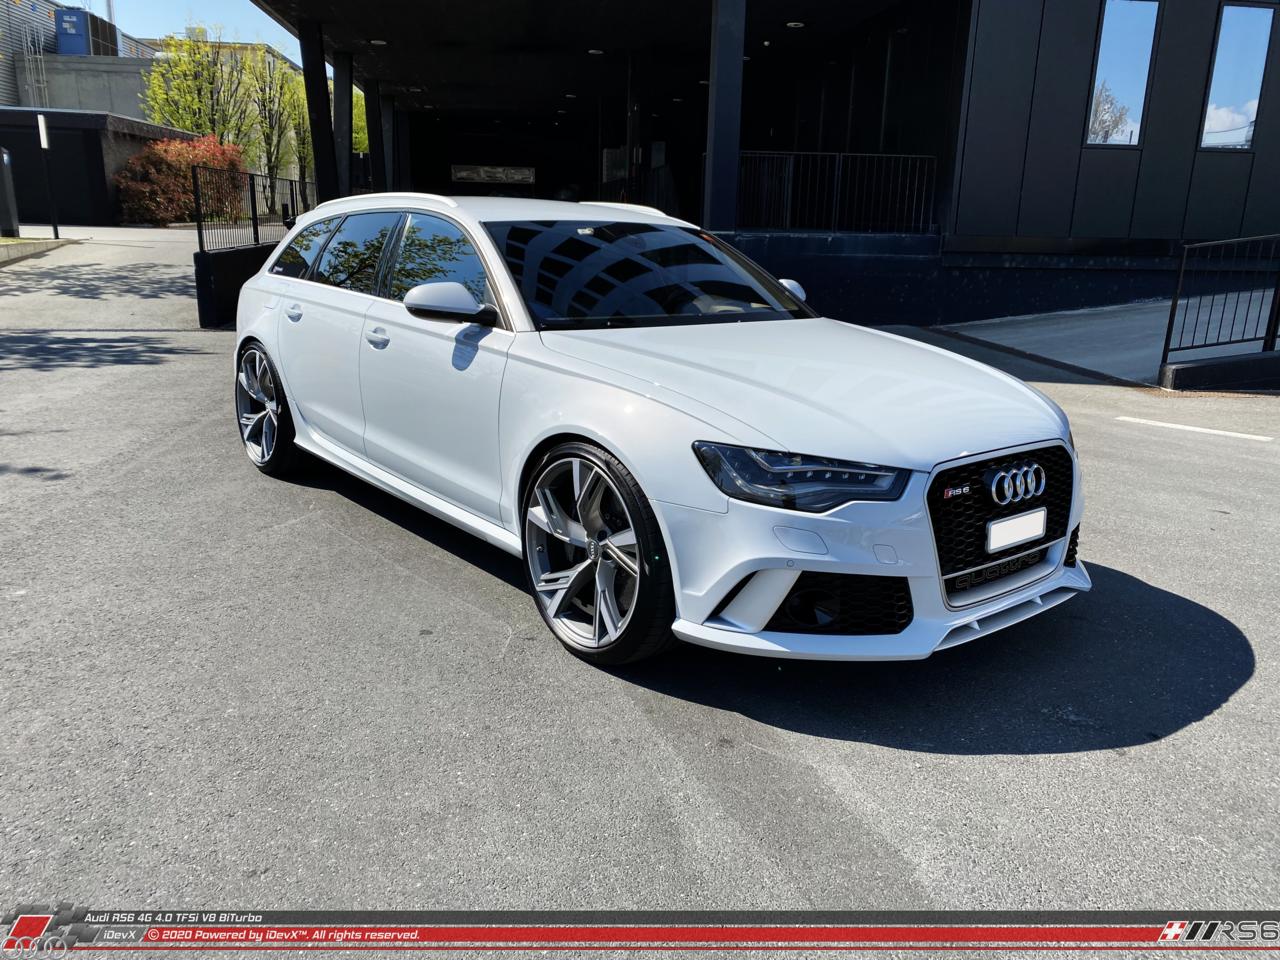 24.04.2020_Audi-RS6_iDevX_004.png